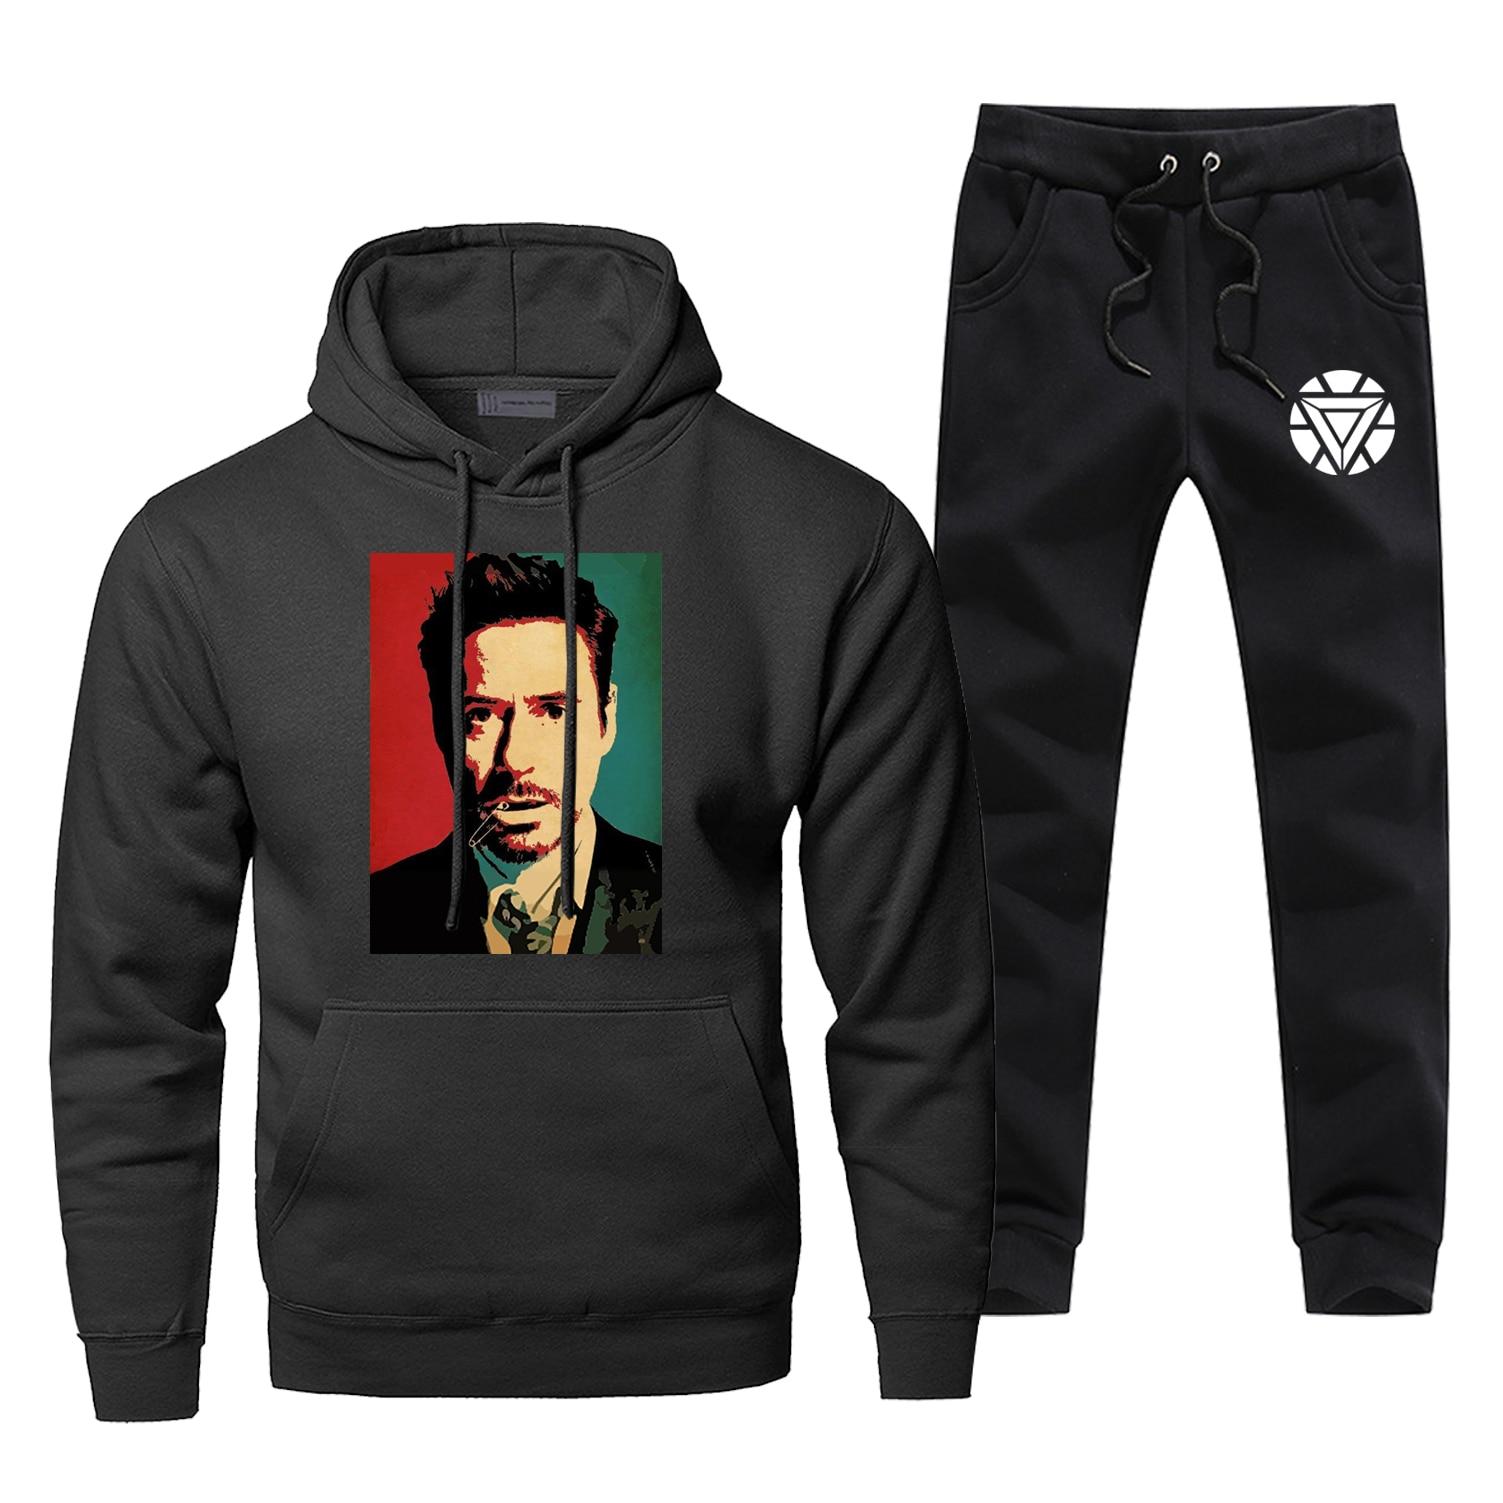 Tony Stark Iron Man Hoodie Pants Set Men Sweatshirt Male Hoodies Sweatshirts Mens Sets Two Piece Pant Pullover Super Hero Coat